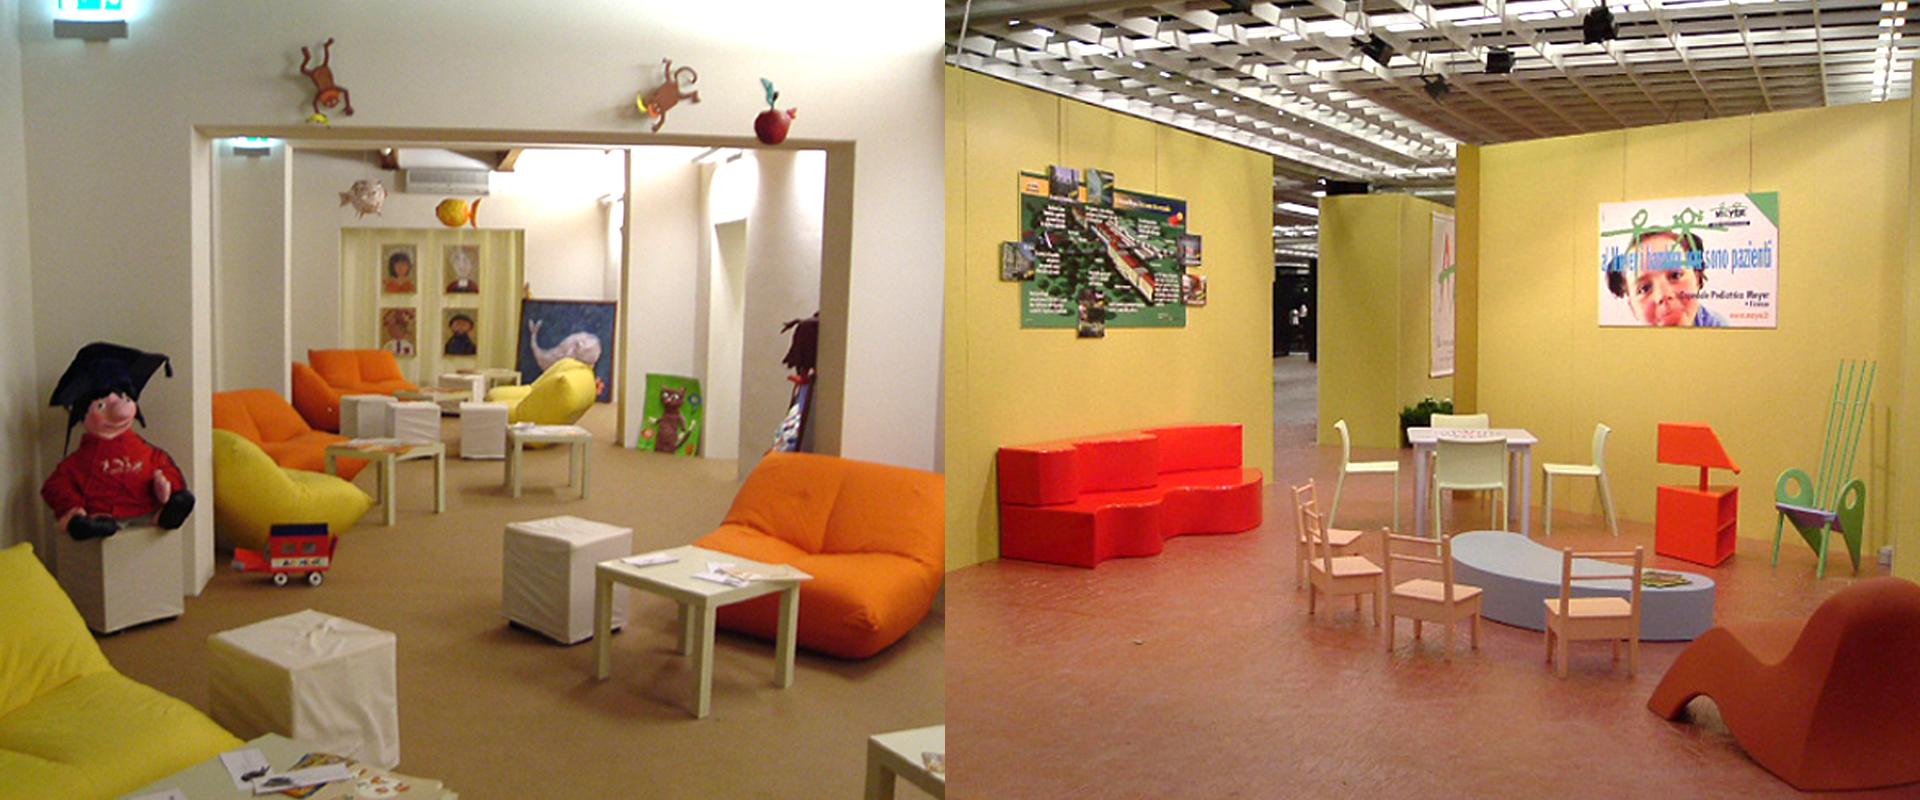 aironic_architettura_design_interior_caretoys_meyer